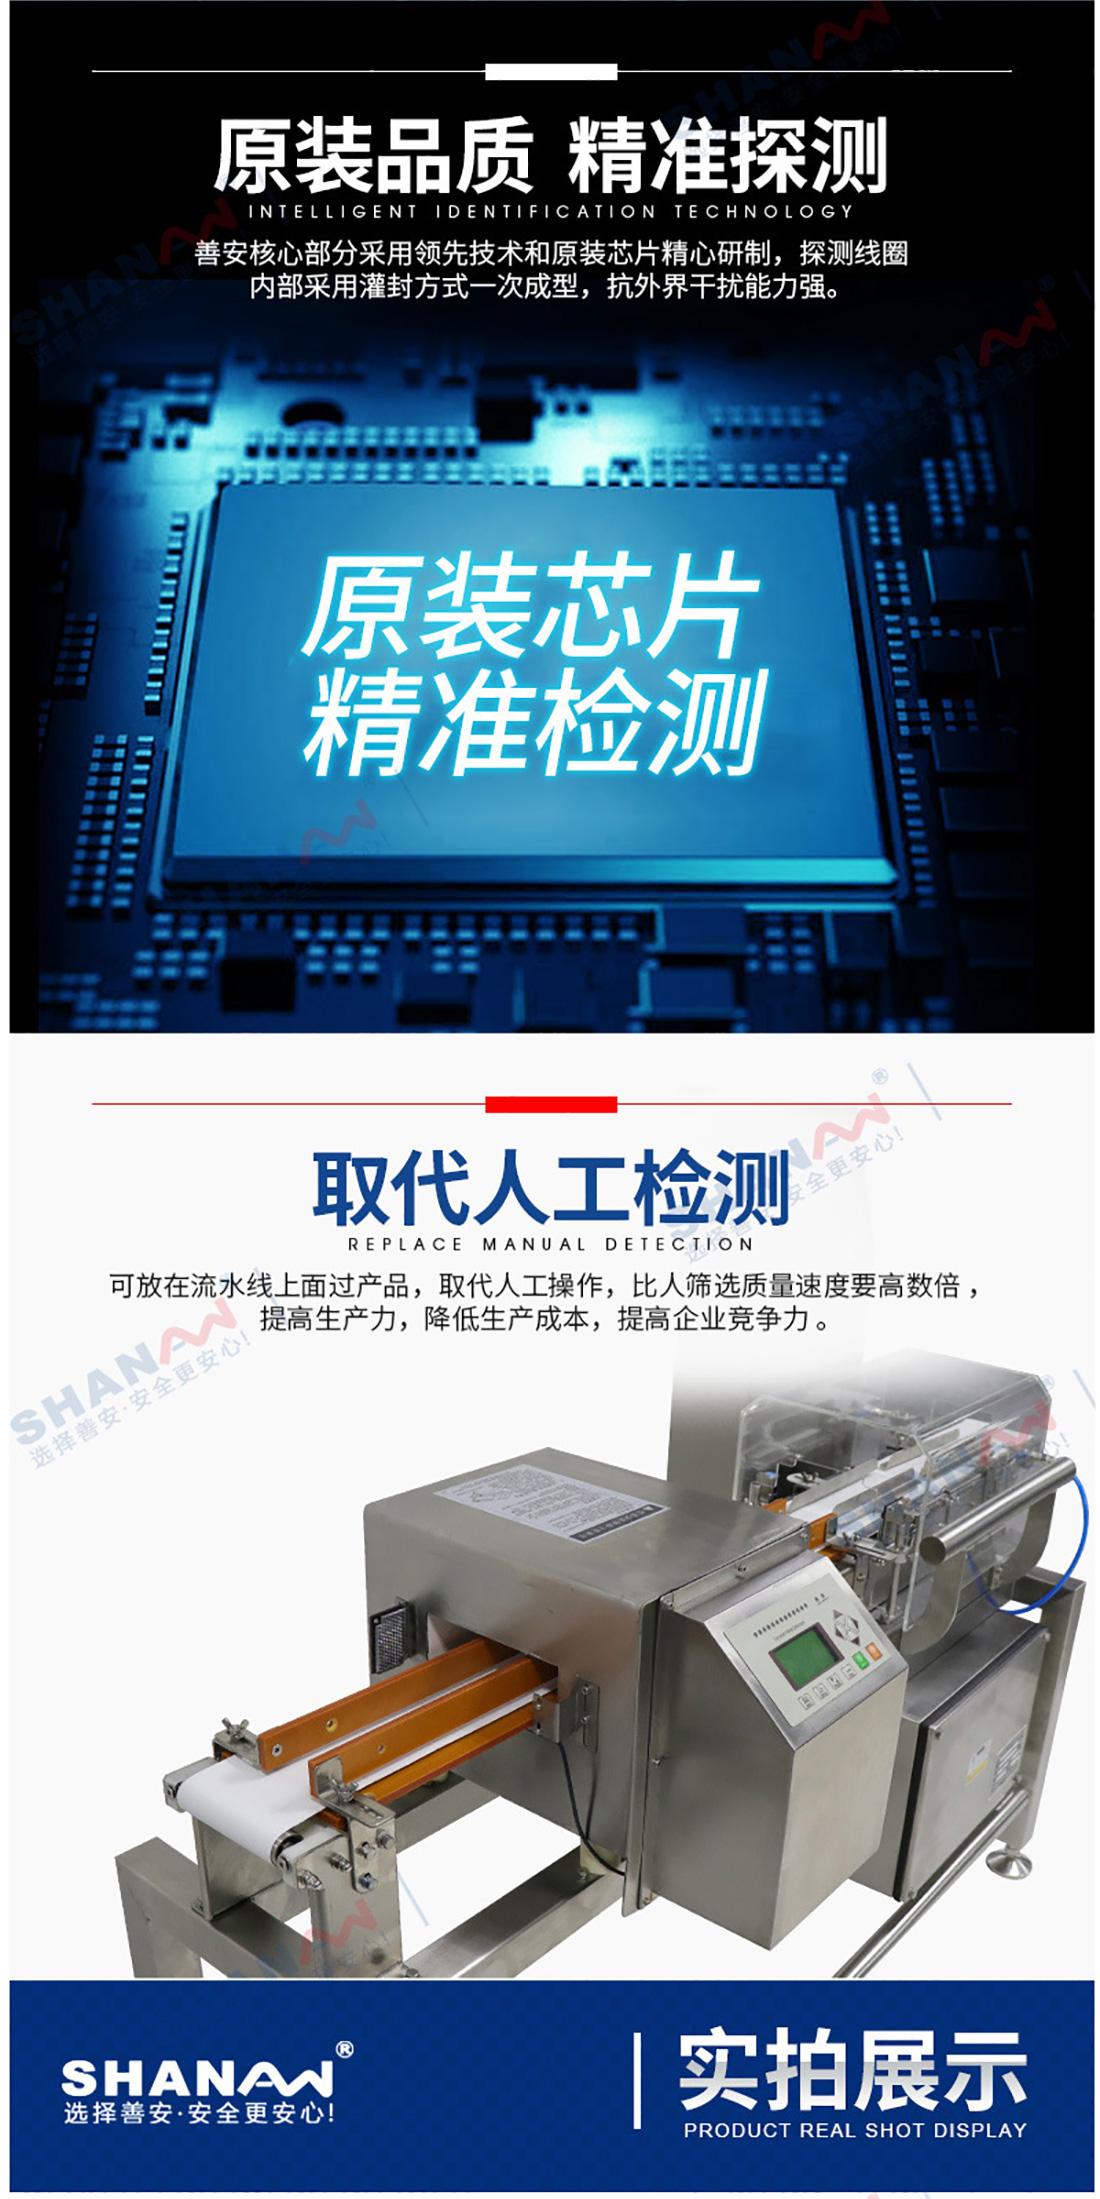 SAMDCW-120A高精度金检称重一体机_05.jpg